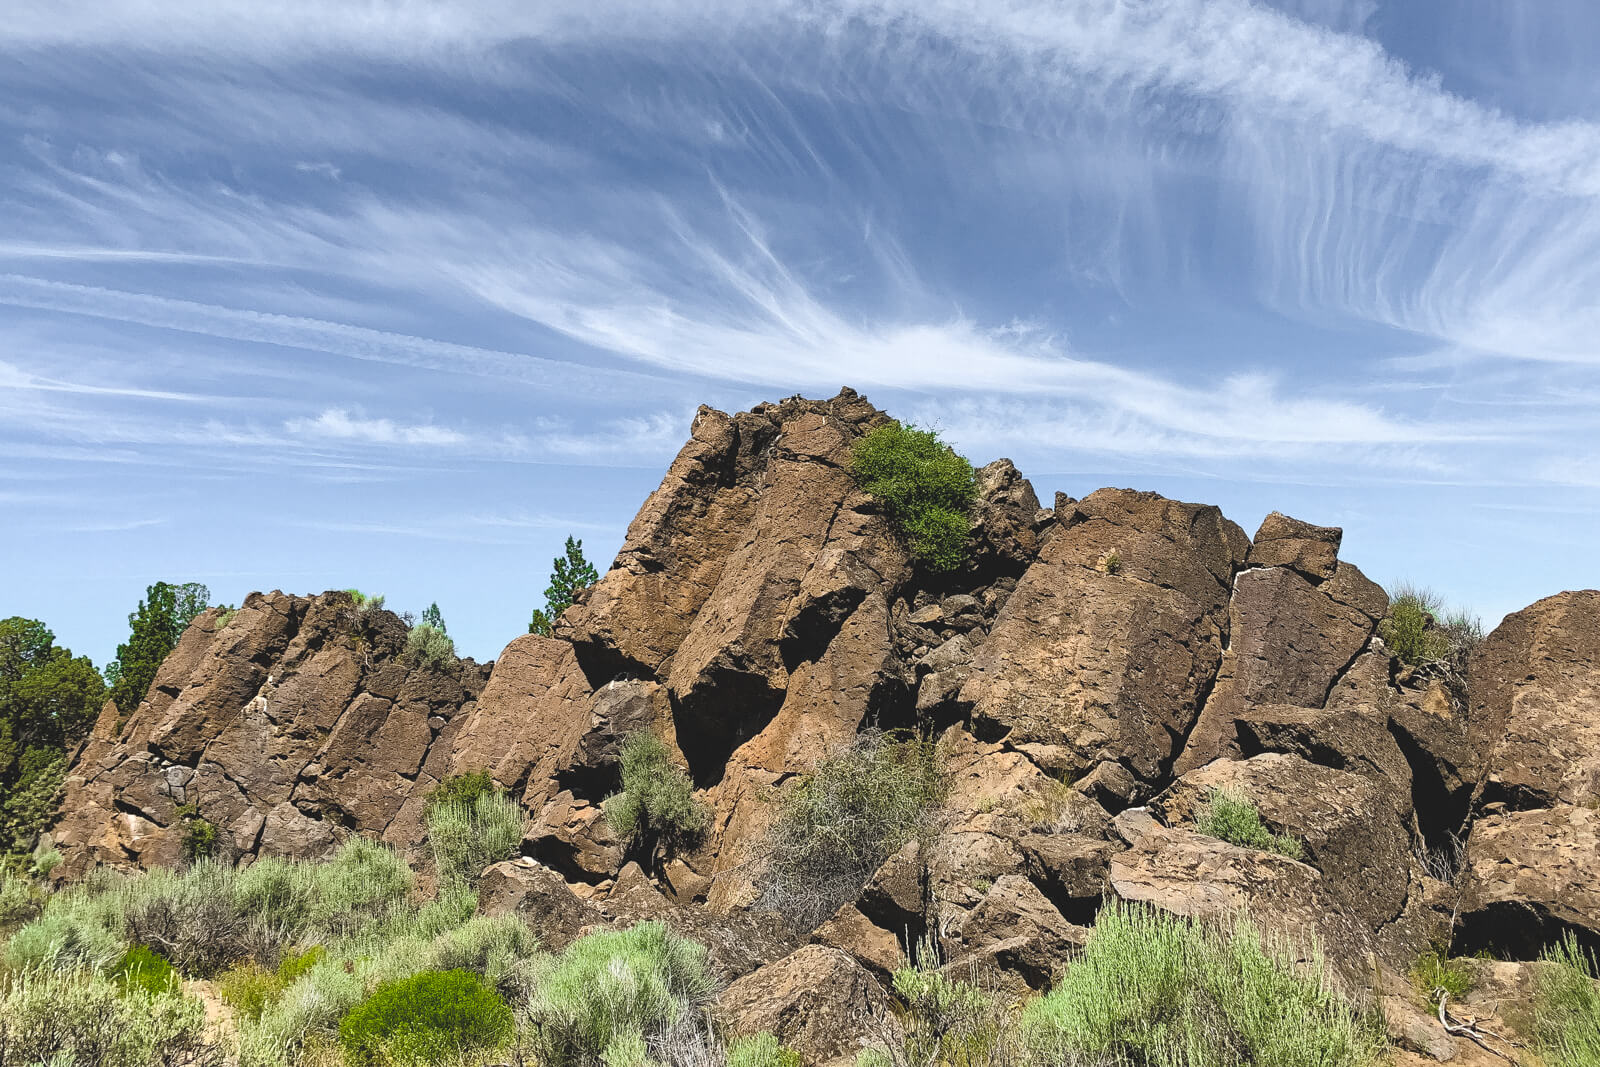 lava rocks stacked high in the Oregon Badlands